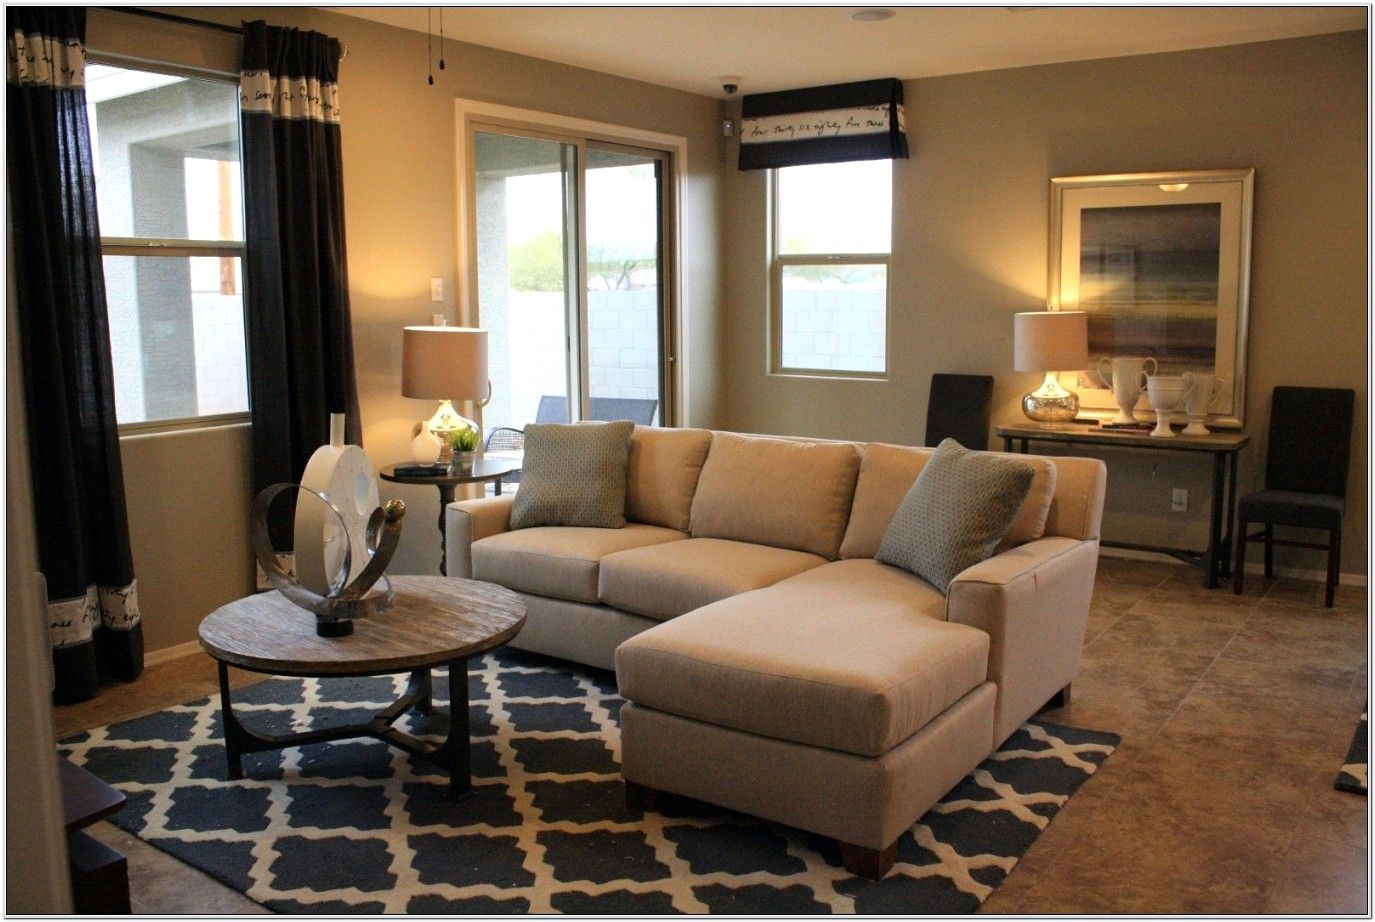 Living Room Ideas With Dark Brown Carpet Brown Carpet Living Room Living Room Carpet Living Room Design Brown